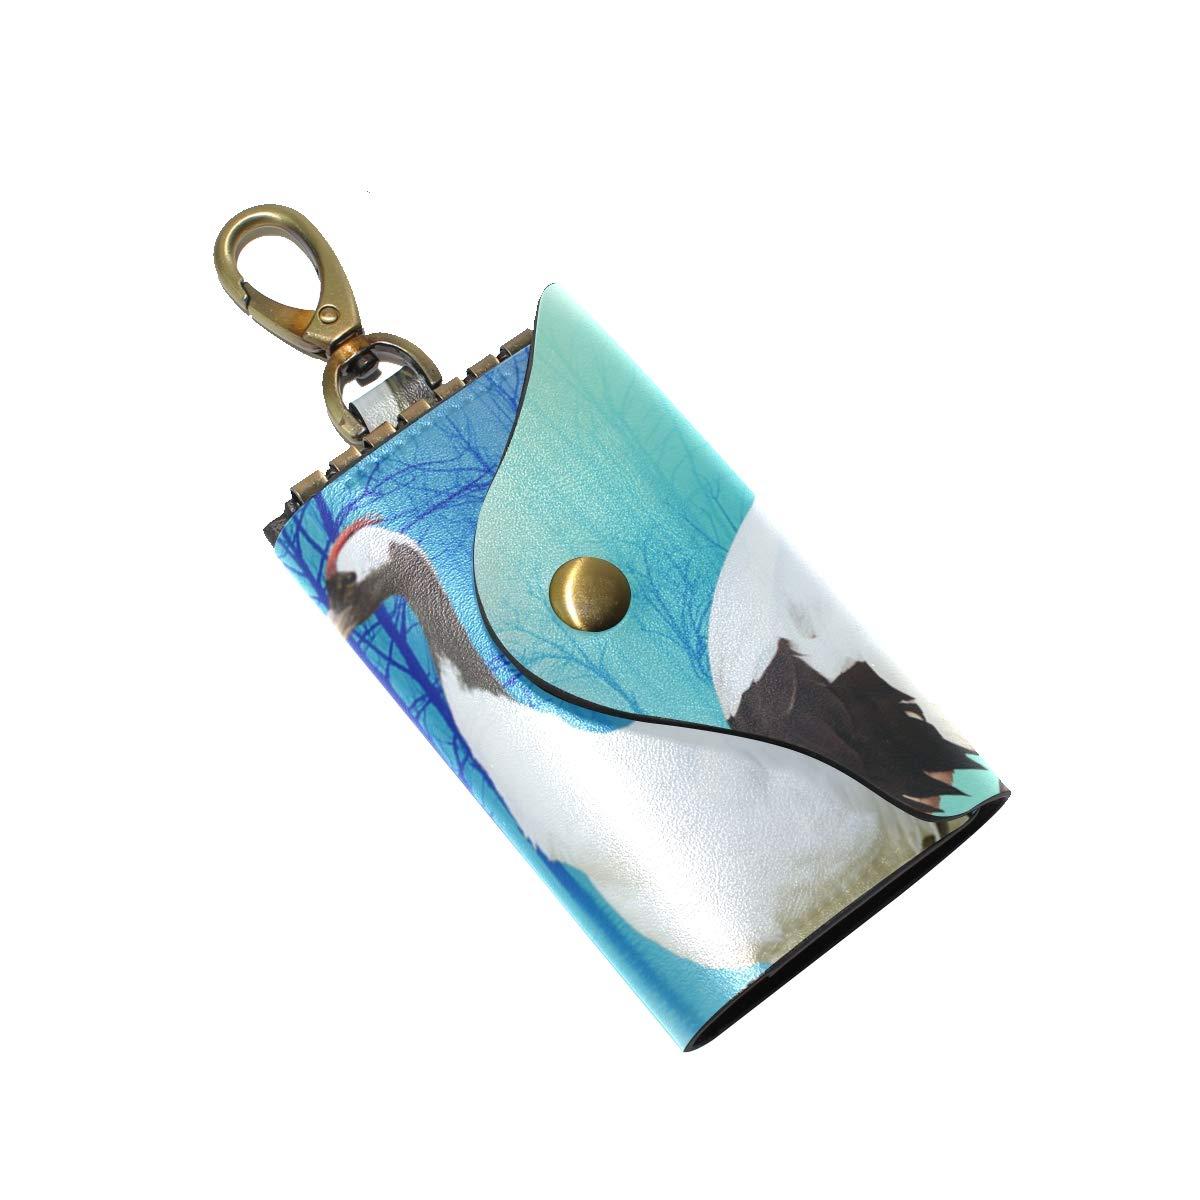 KEAKIA Art Ibises Bird Leather Key Case Wallets Tri-fold Key Holder Keychains with 6 Hooks 2 Slot Snap Closure for Men Women